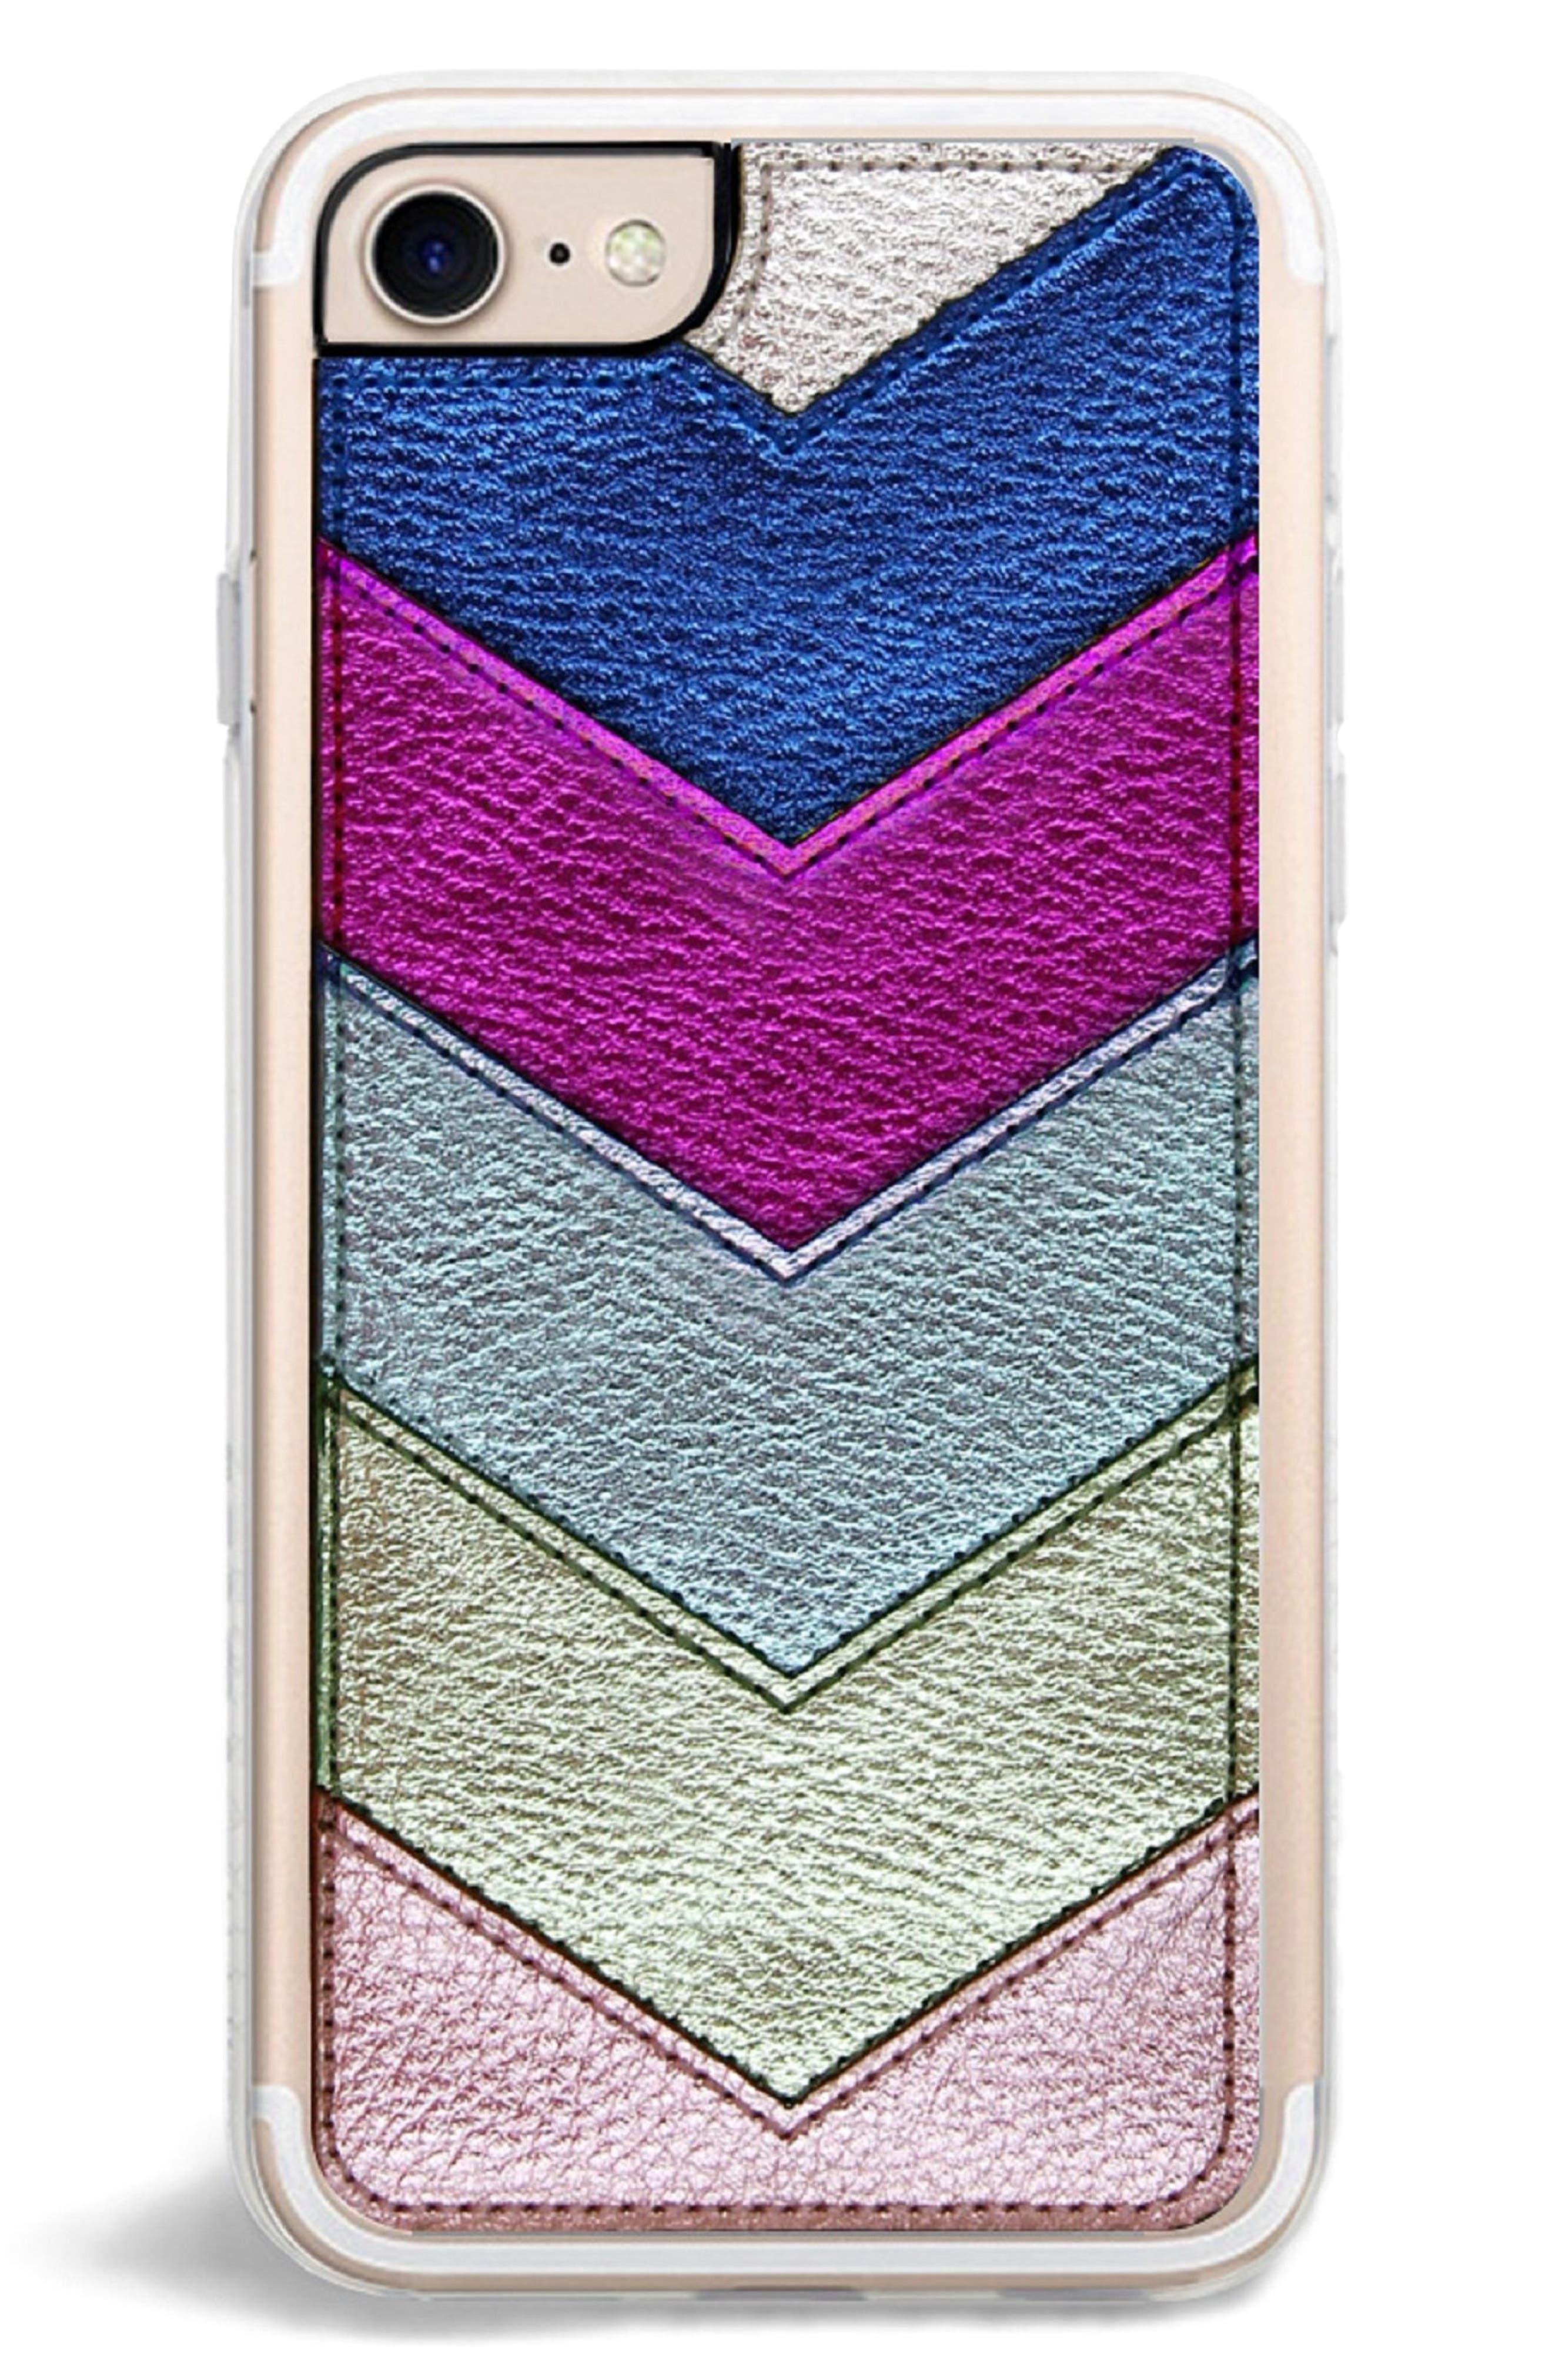 Chevron Faux Leather iPhone 6/6s/7/8 & 6/6s/7/8 Plus Case,                             Alternate thumbnail 3, color,                             Metallic Multi